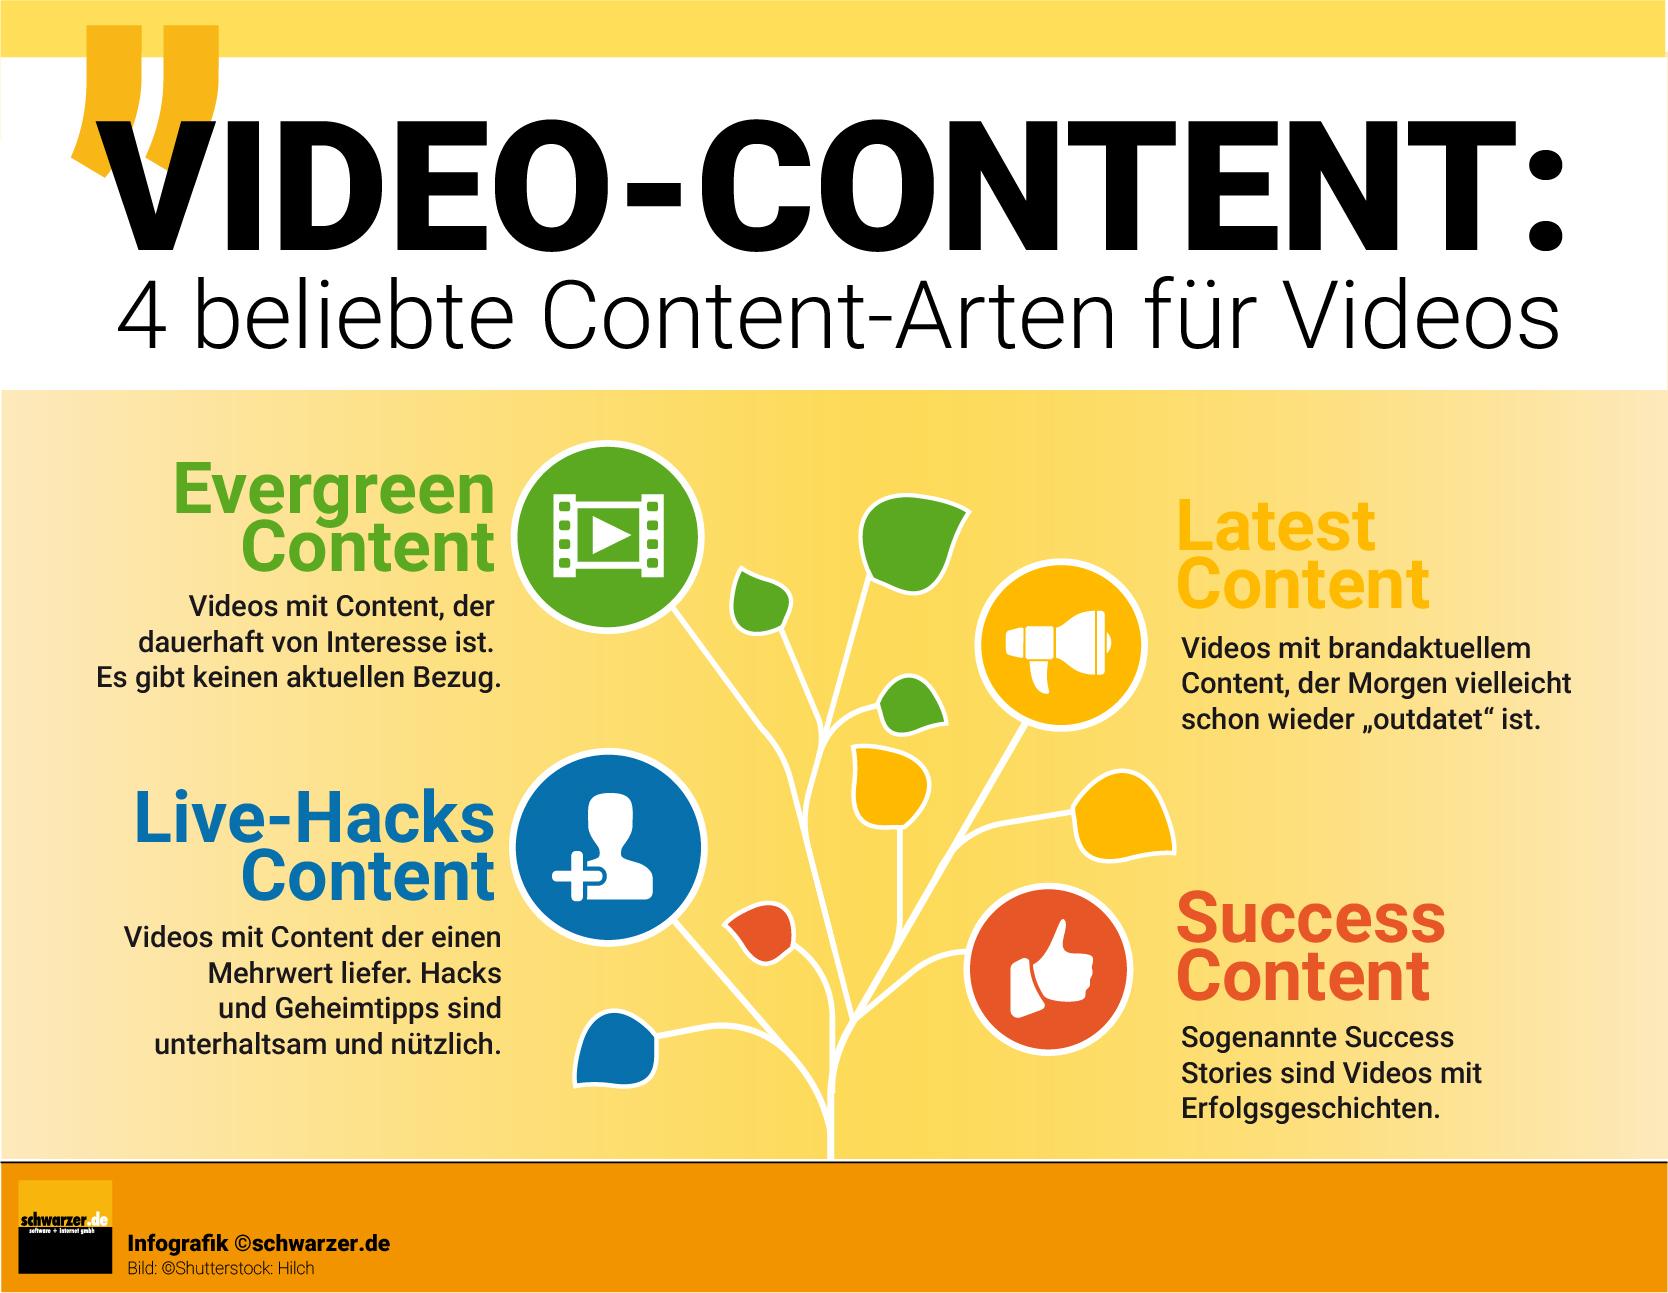 Infografik: Video Content - 4 beliebte Content-Arten für Videos.